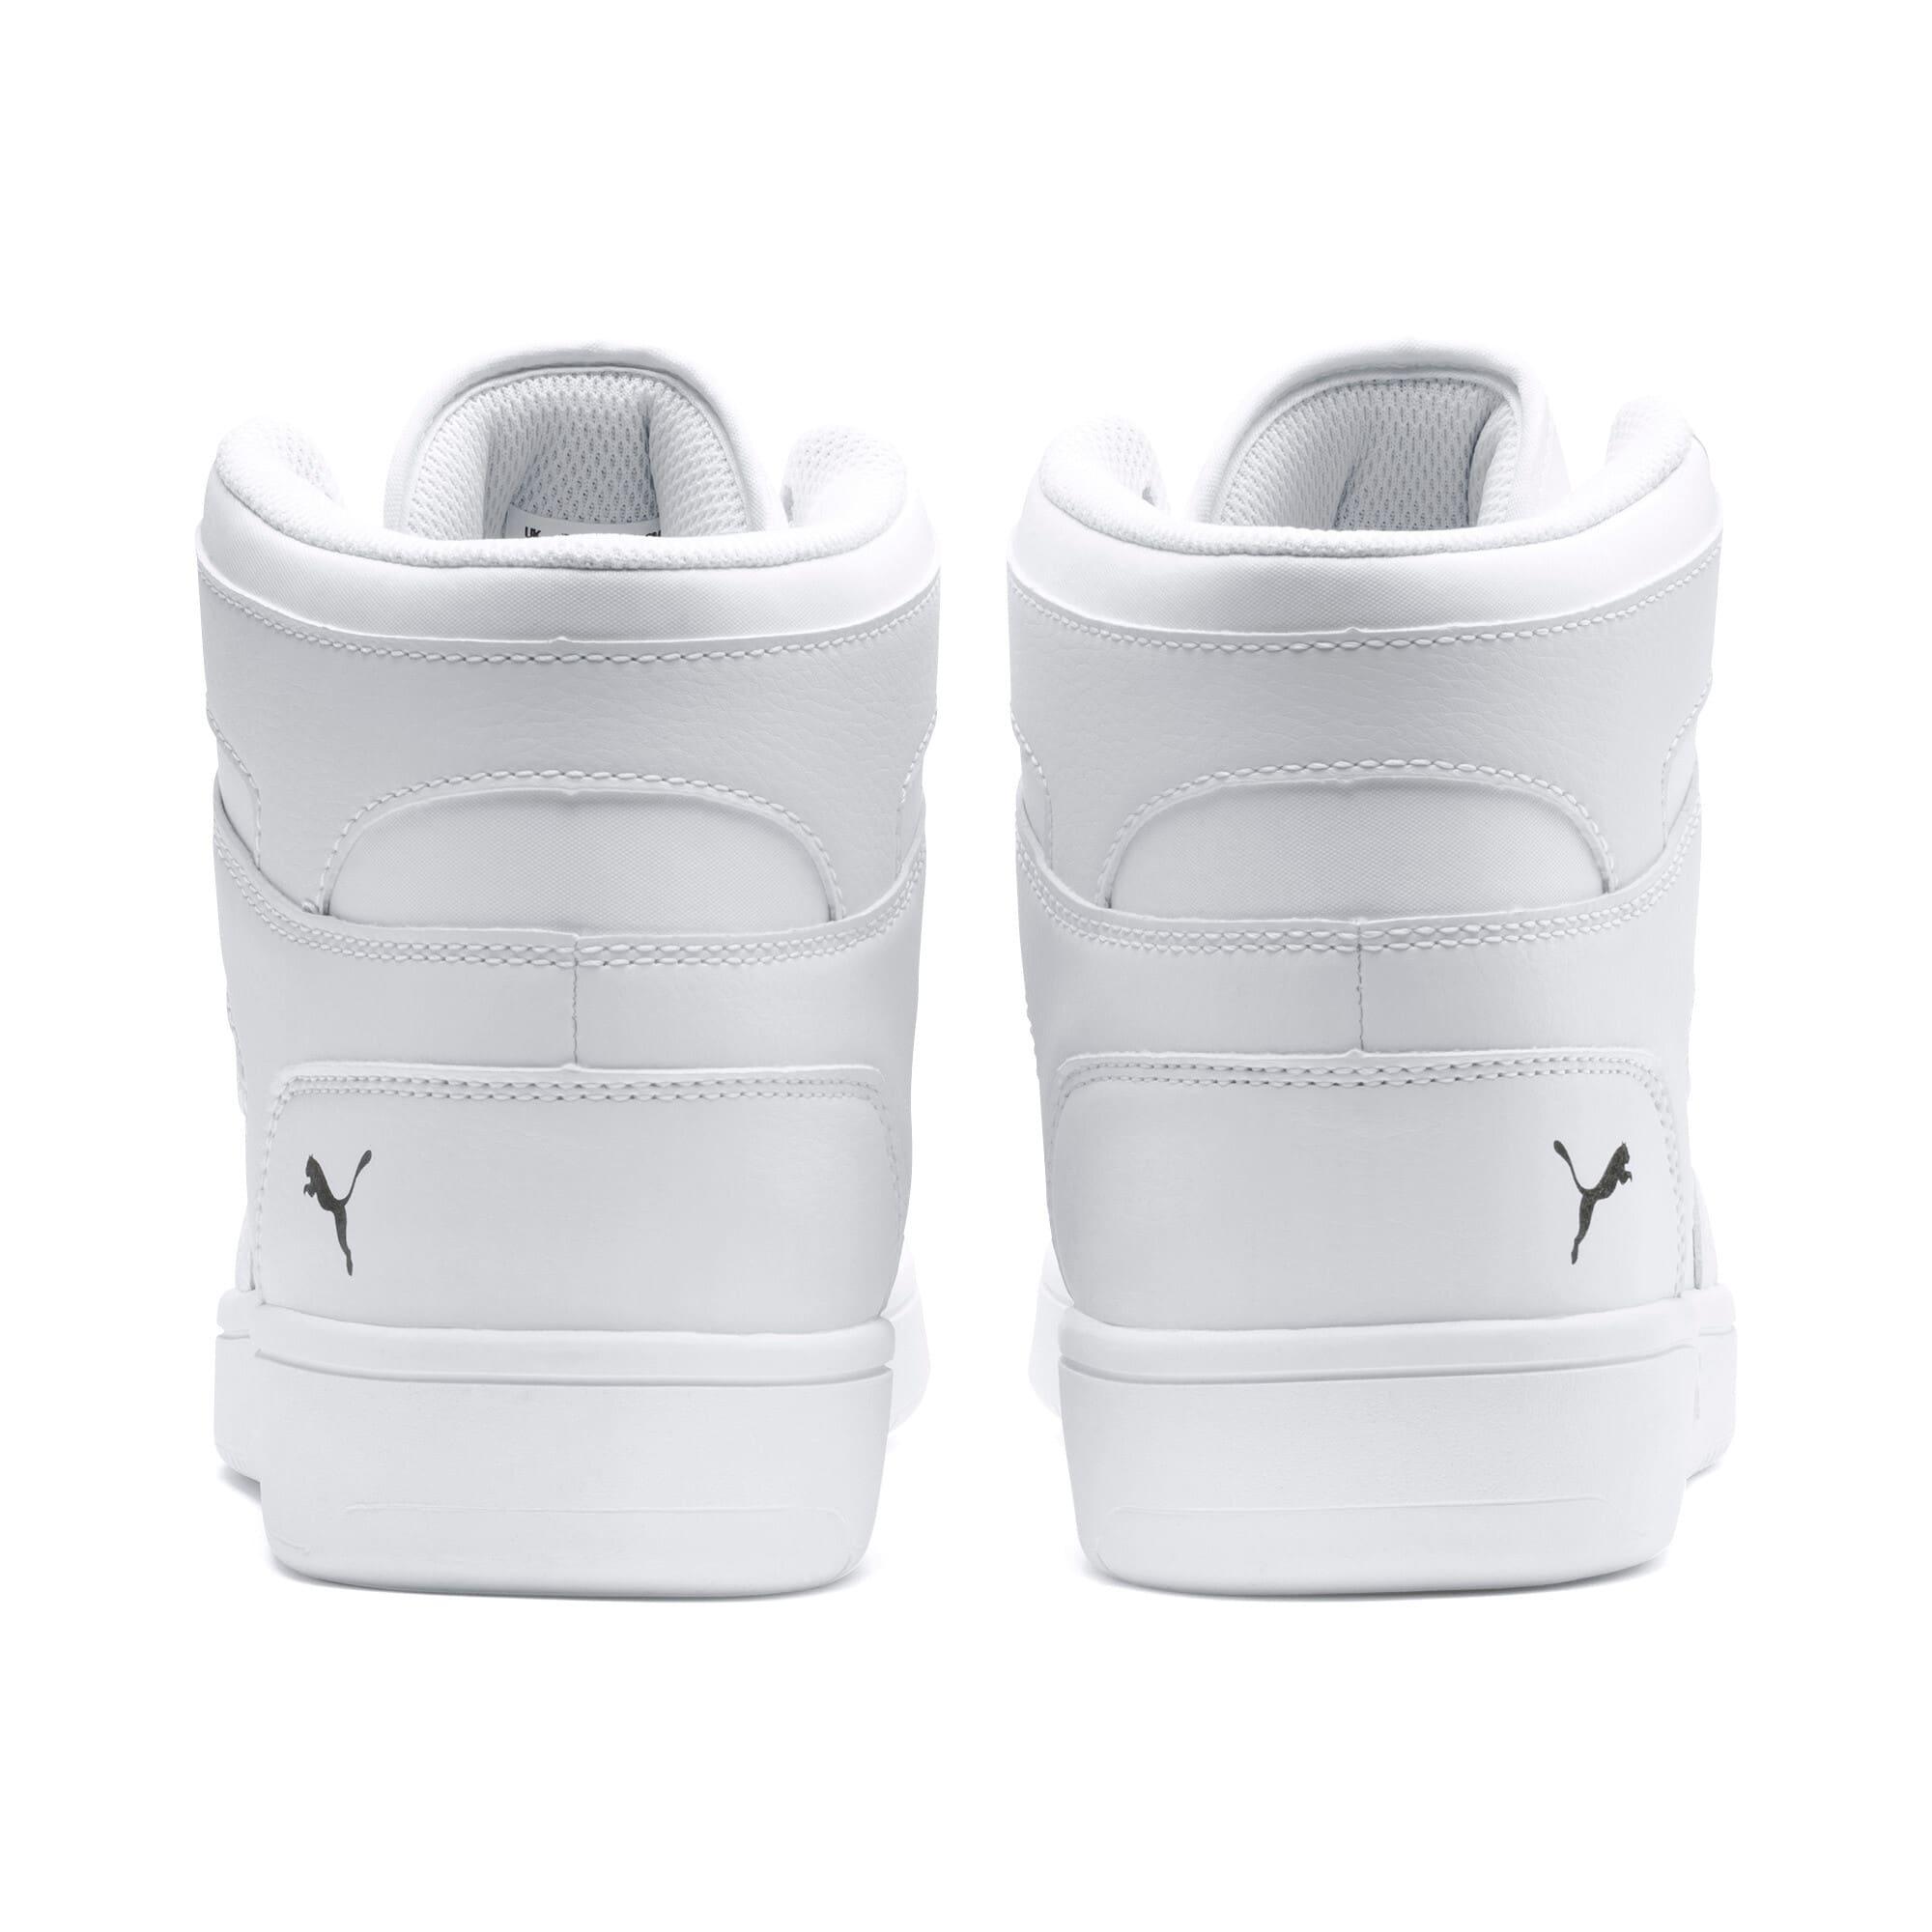 Thumbnail 3 of PUMA Rebound LayUp Sneakers, Puma White-Puma Black, medium